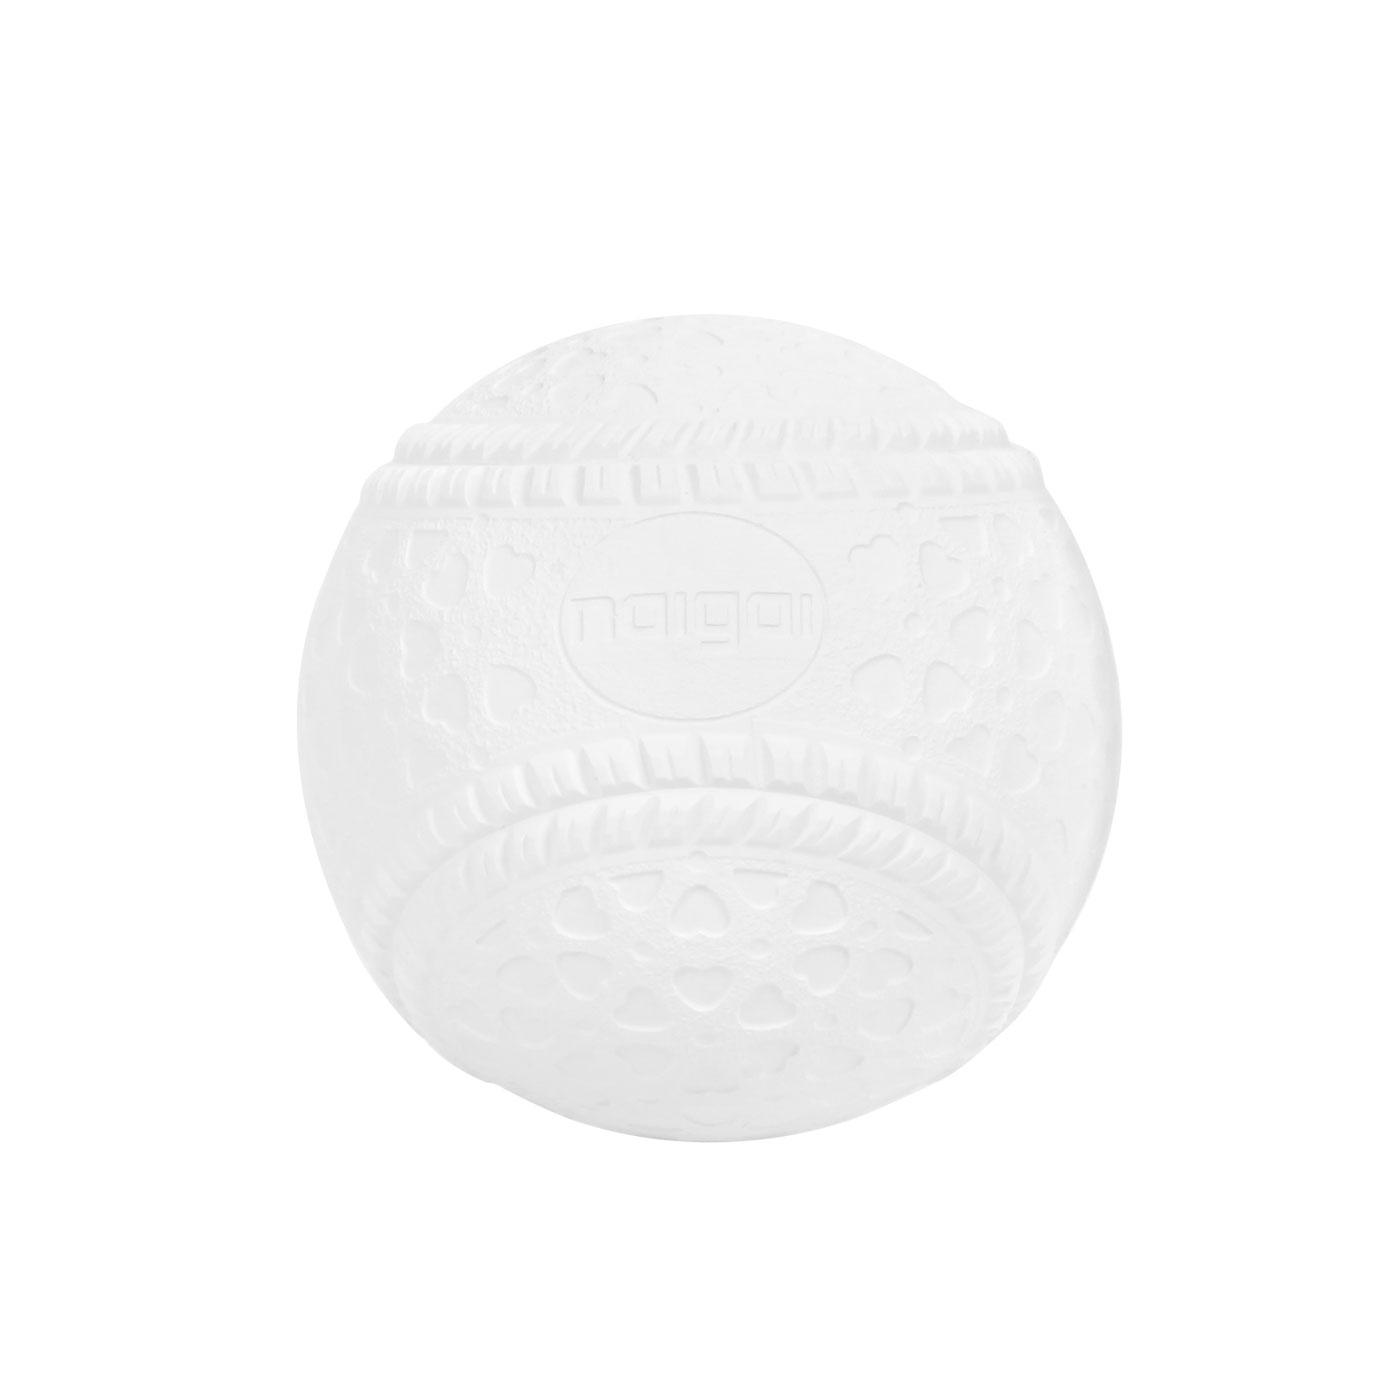 JEX田徑用品 日製-軟式棒球(單顆裝)A-BABL-211M-1 - 白